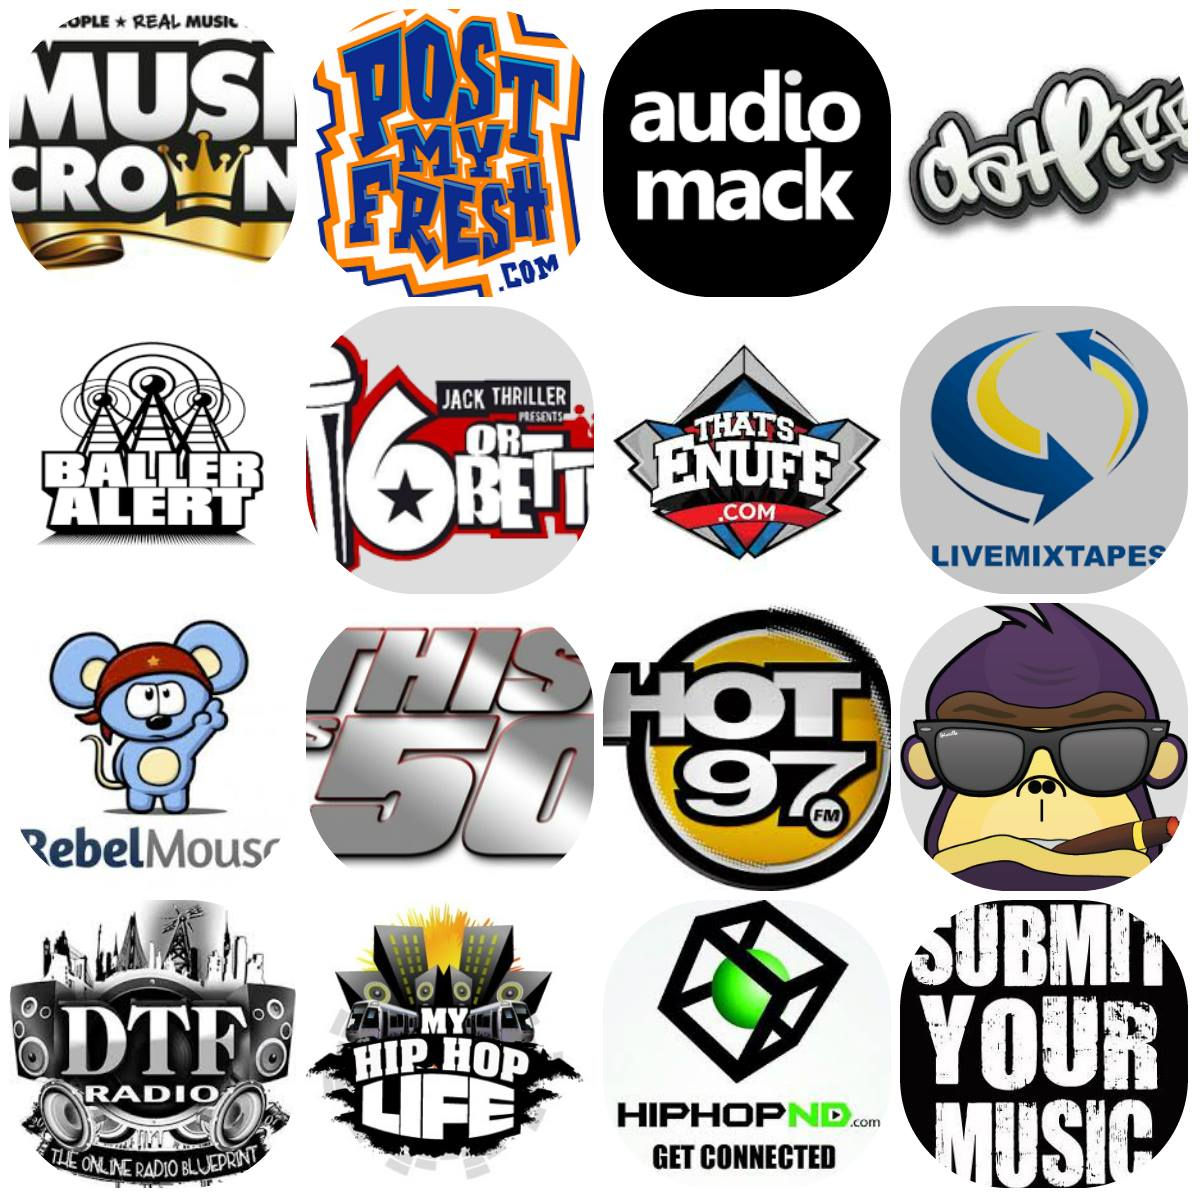 Hip hop dating site